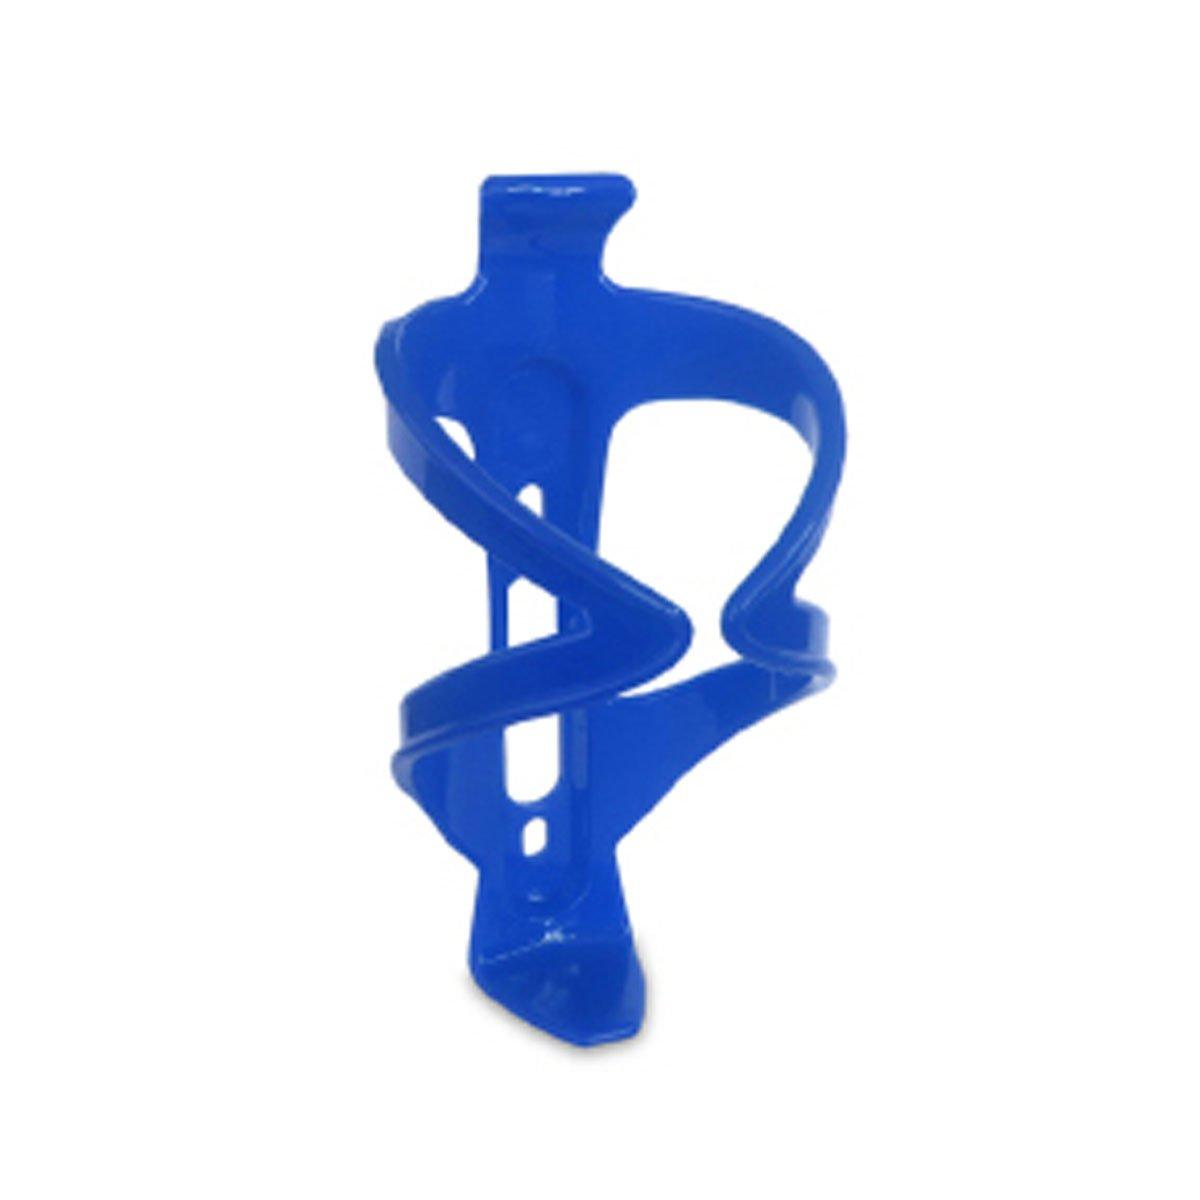 Clean Motion Cbc-02 Resin Bottle Cage Blue